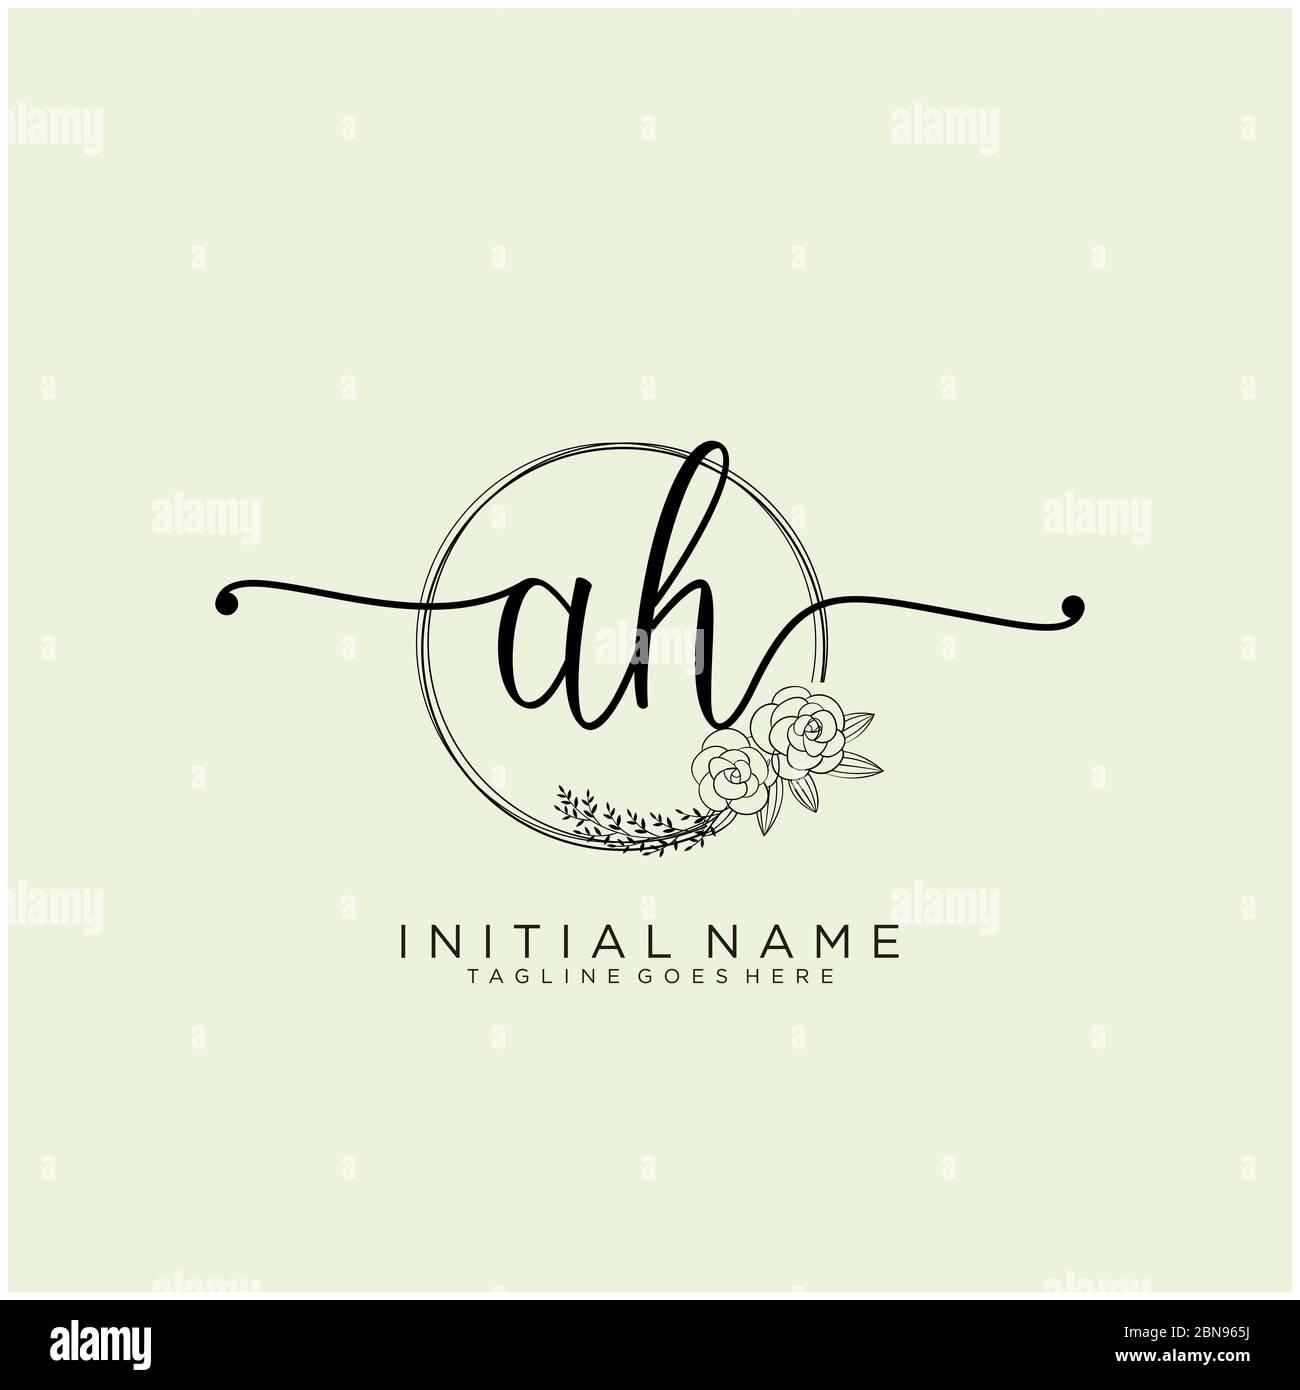 Initial Ah Beauty Monogram And Elegant Logo Design Stock Vector Image Art Alamy